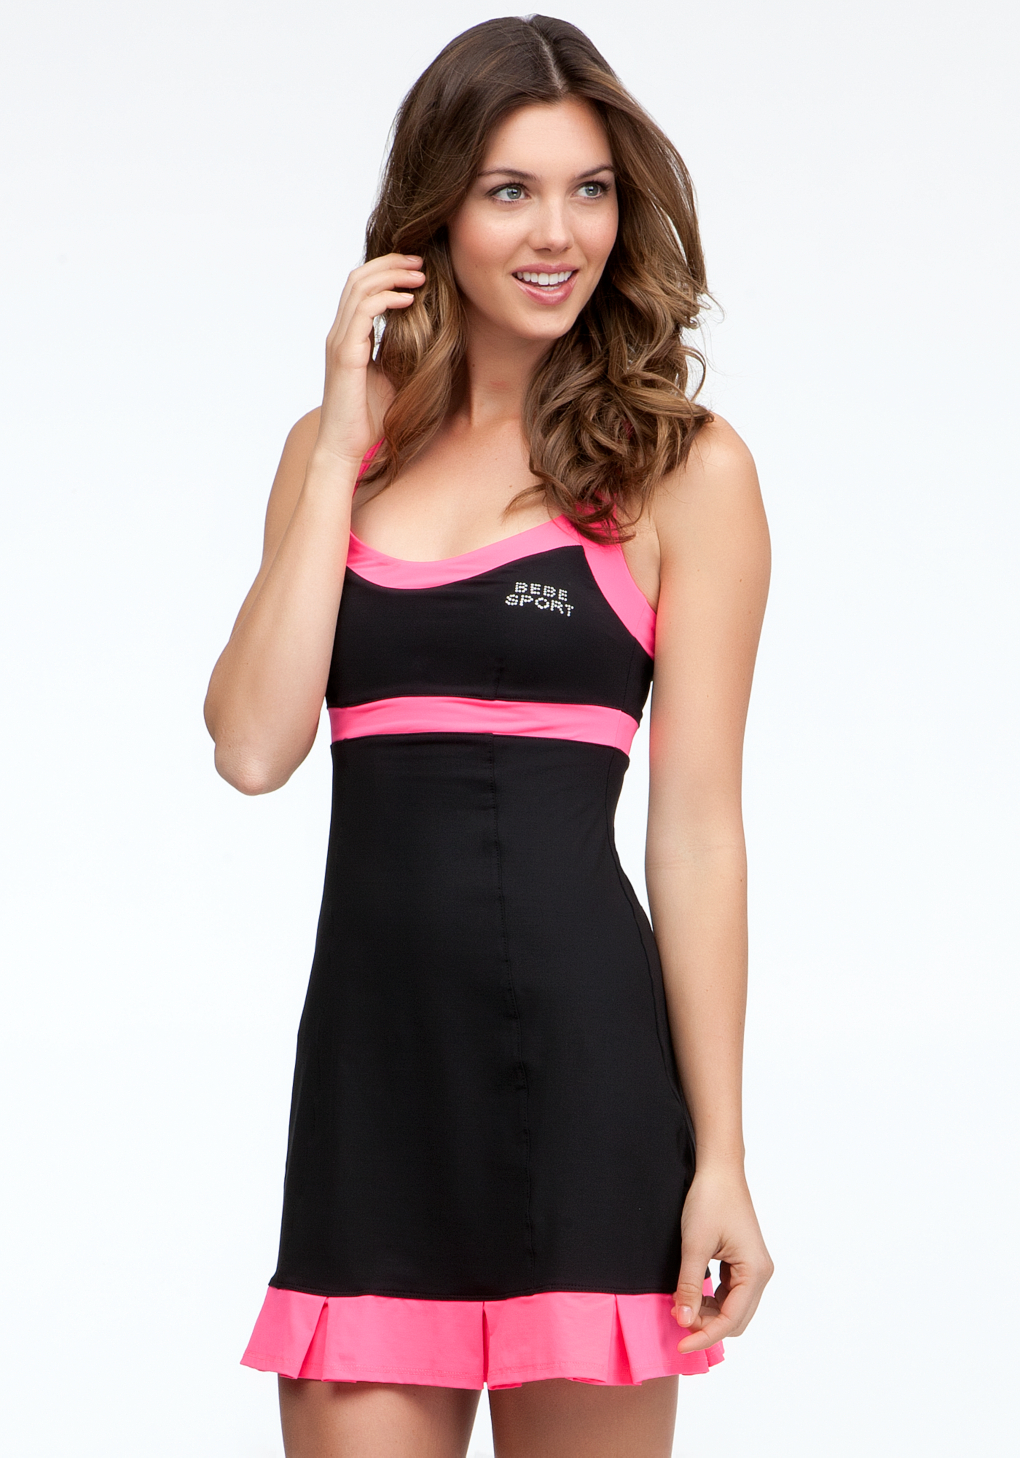 Bebe Colorblock Tennis Dress Bebe Sport in Black | Lyst